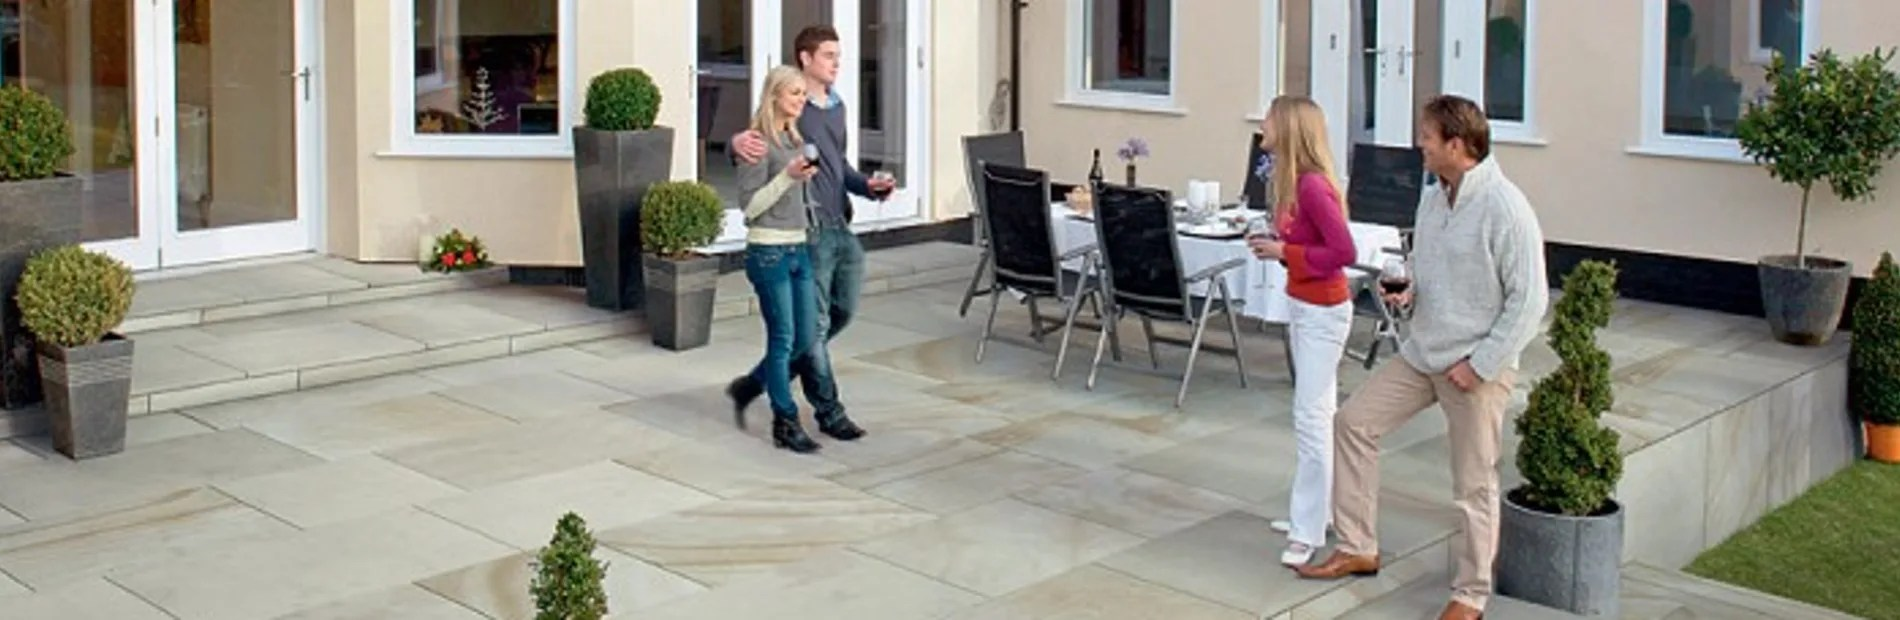 natural stone patio ideas marshalls